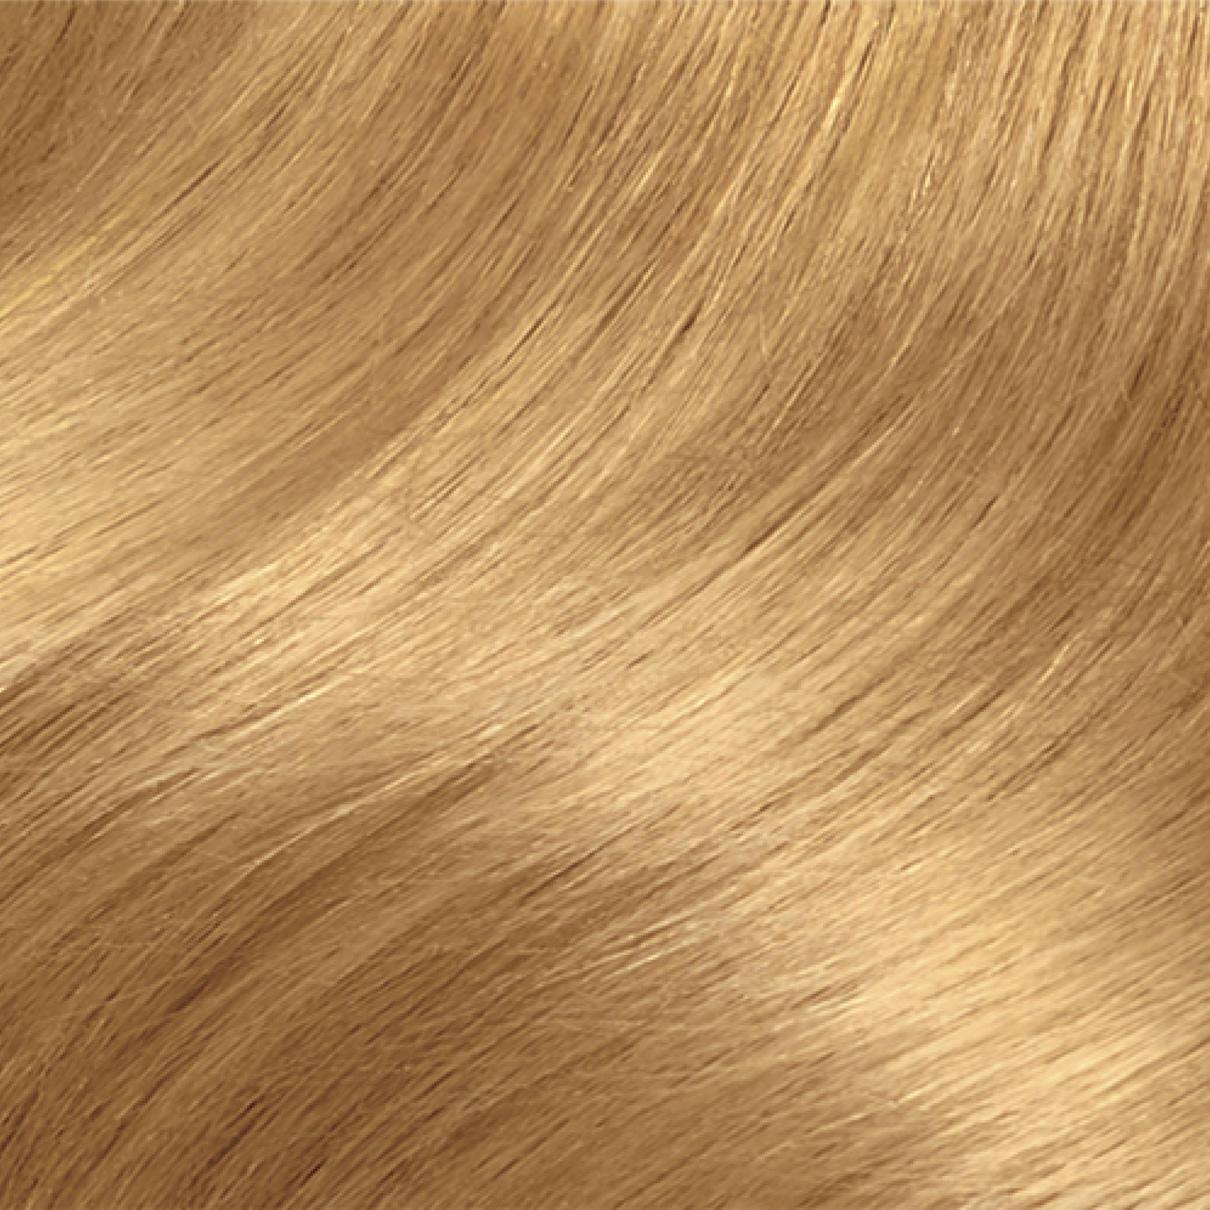 Permanent hair color clairol nice n easy 8g medium golden blonde nvjuhfo Gallery